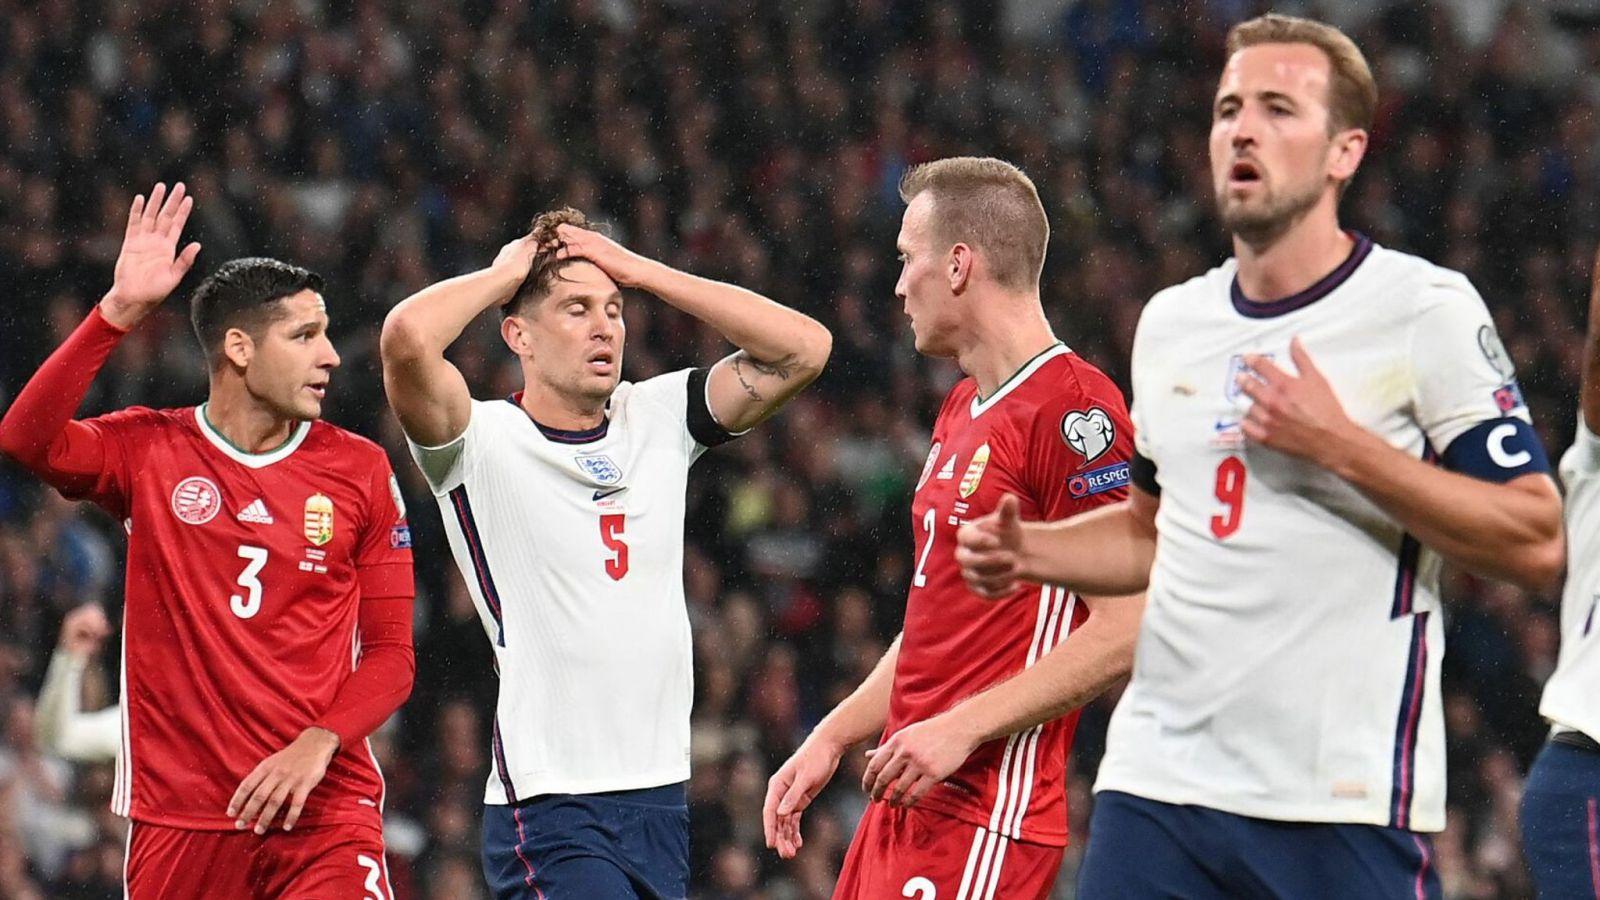 England 1-1 Hungary (WC Qualif.) 2021.10.12 (19h45) Full Goals Highlight